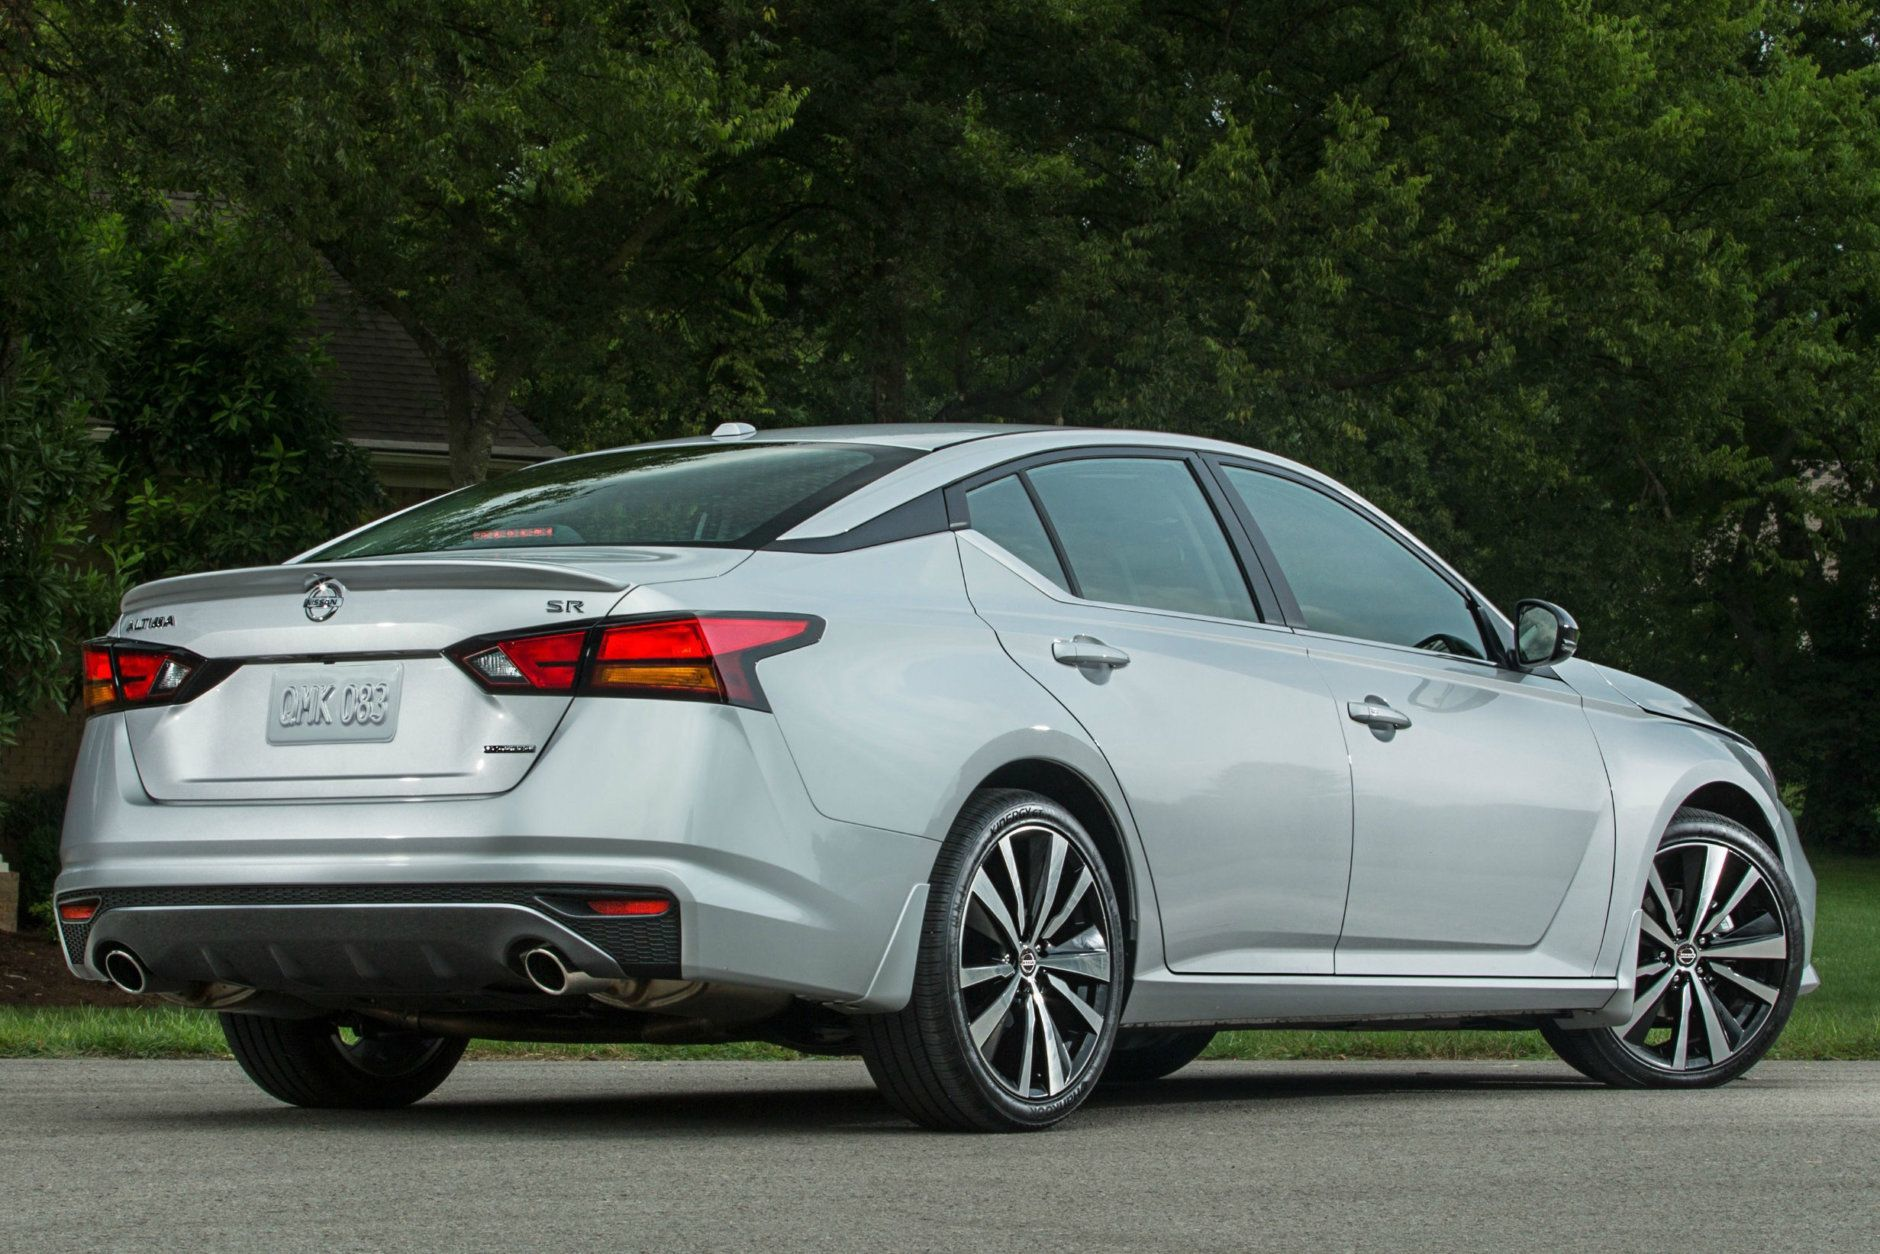 2019 Nissan Altima Purchase Deal: 0% financing for 36 months plus $2,000 bonus cash (Courtesy Nissan North America)